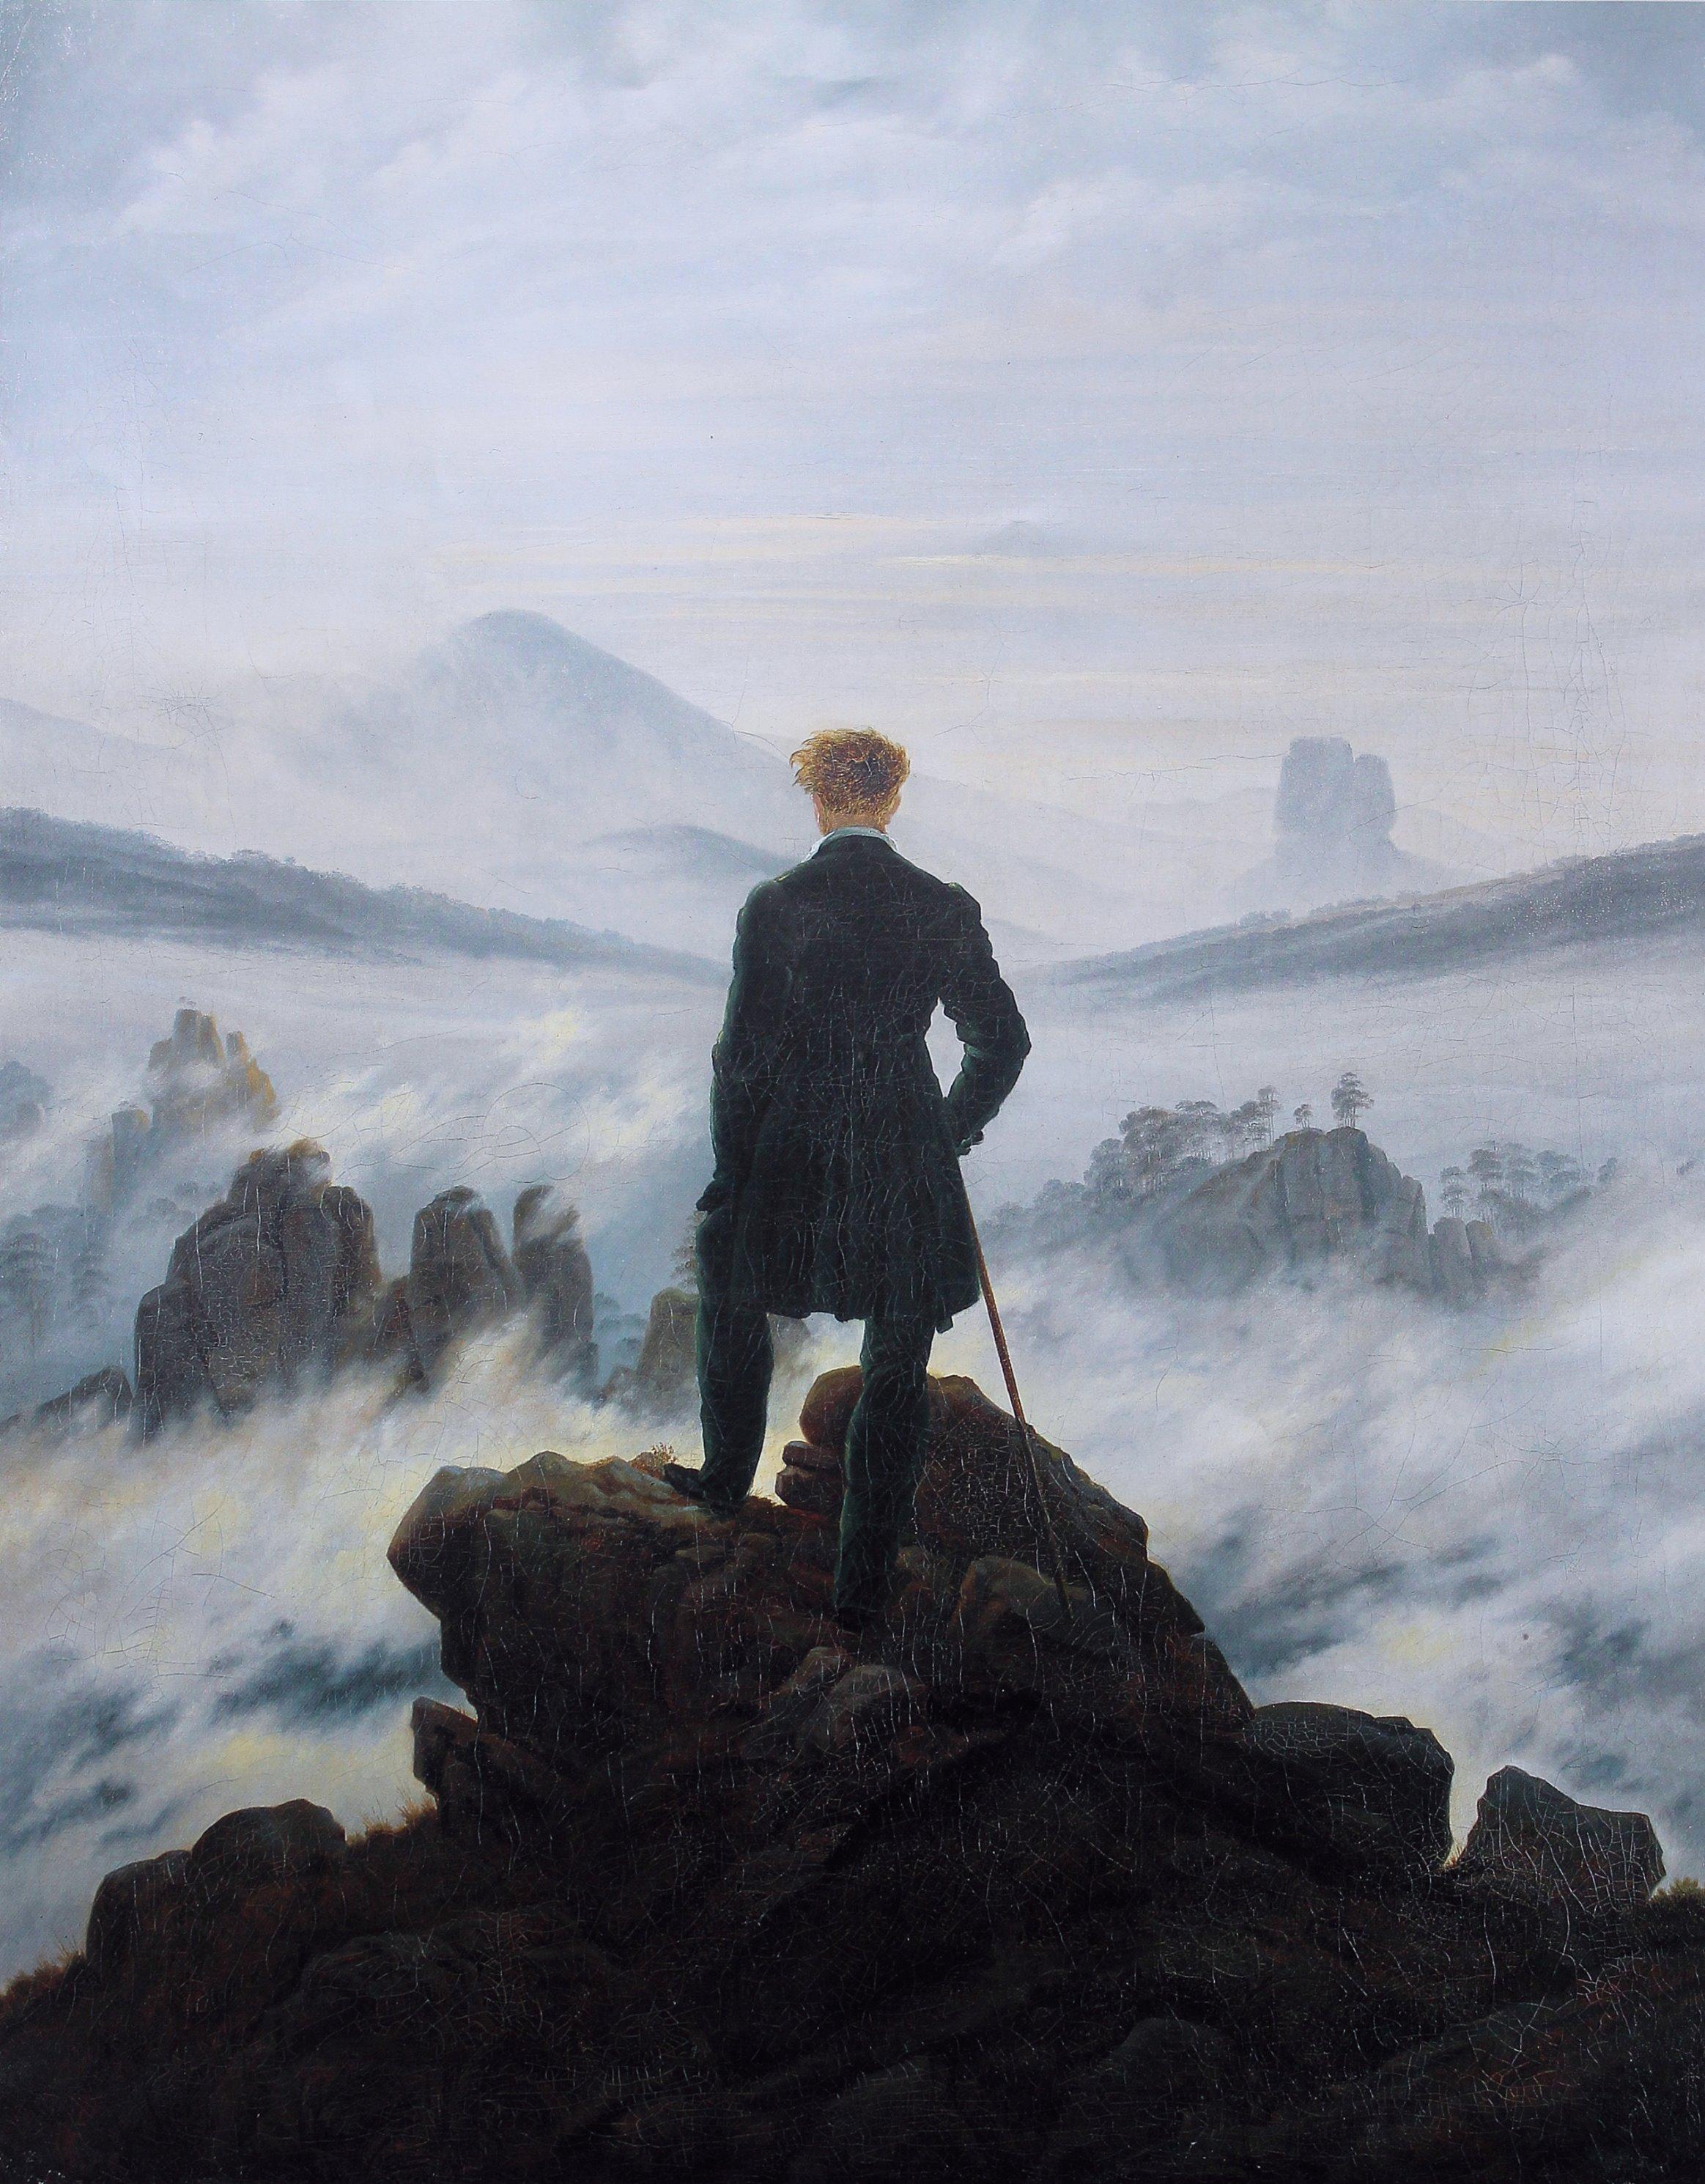 De wandelaar boven de nevelen - Caspar David Friedrich, gemaakt rond 1818